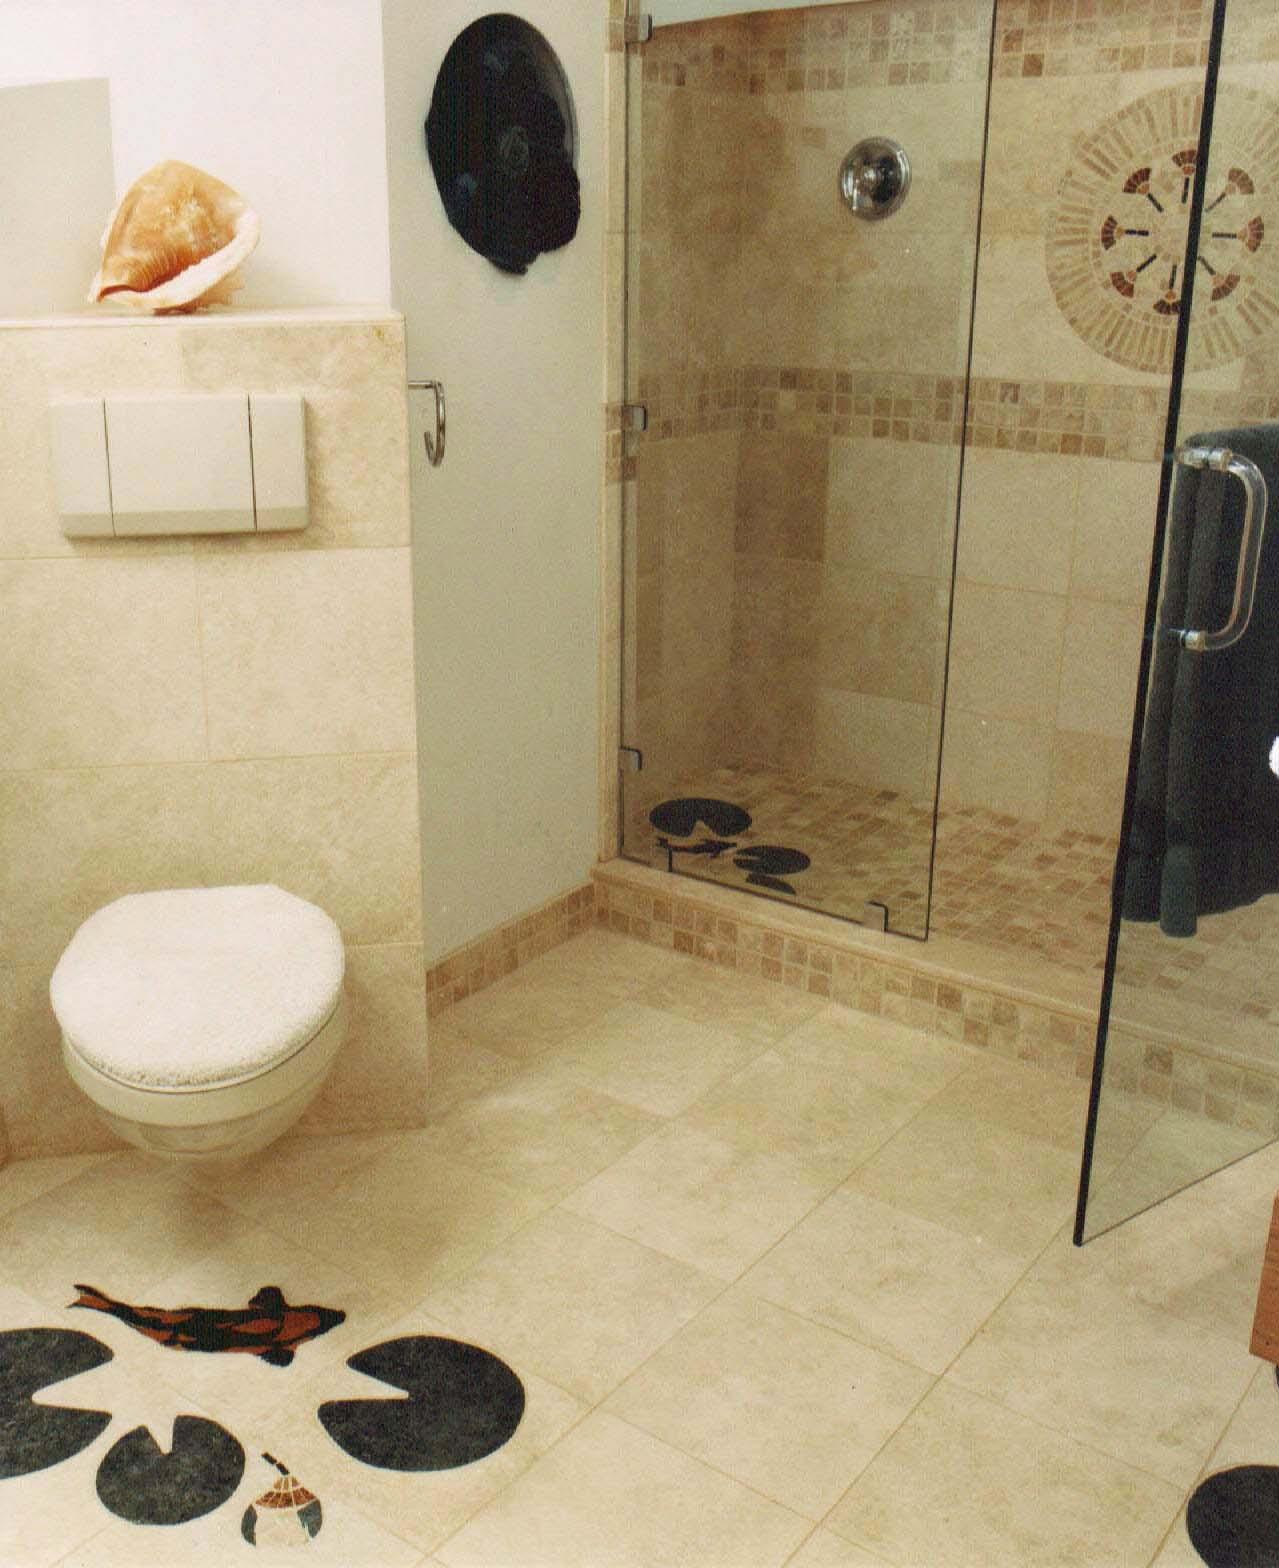 Dgobathroomflowermedallion.jpg